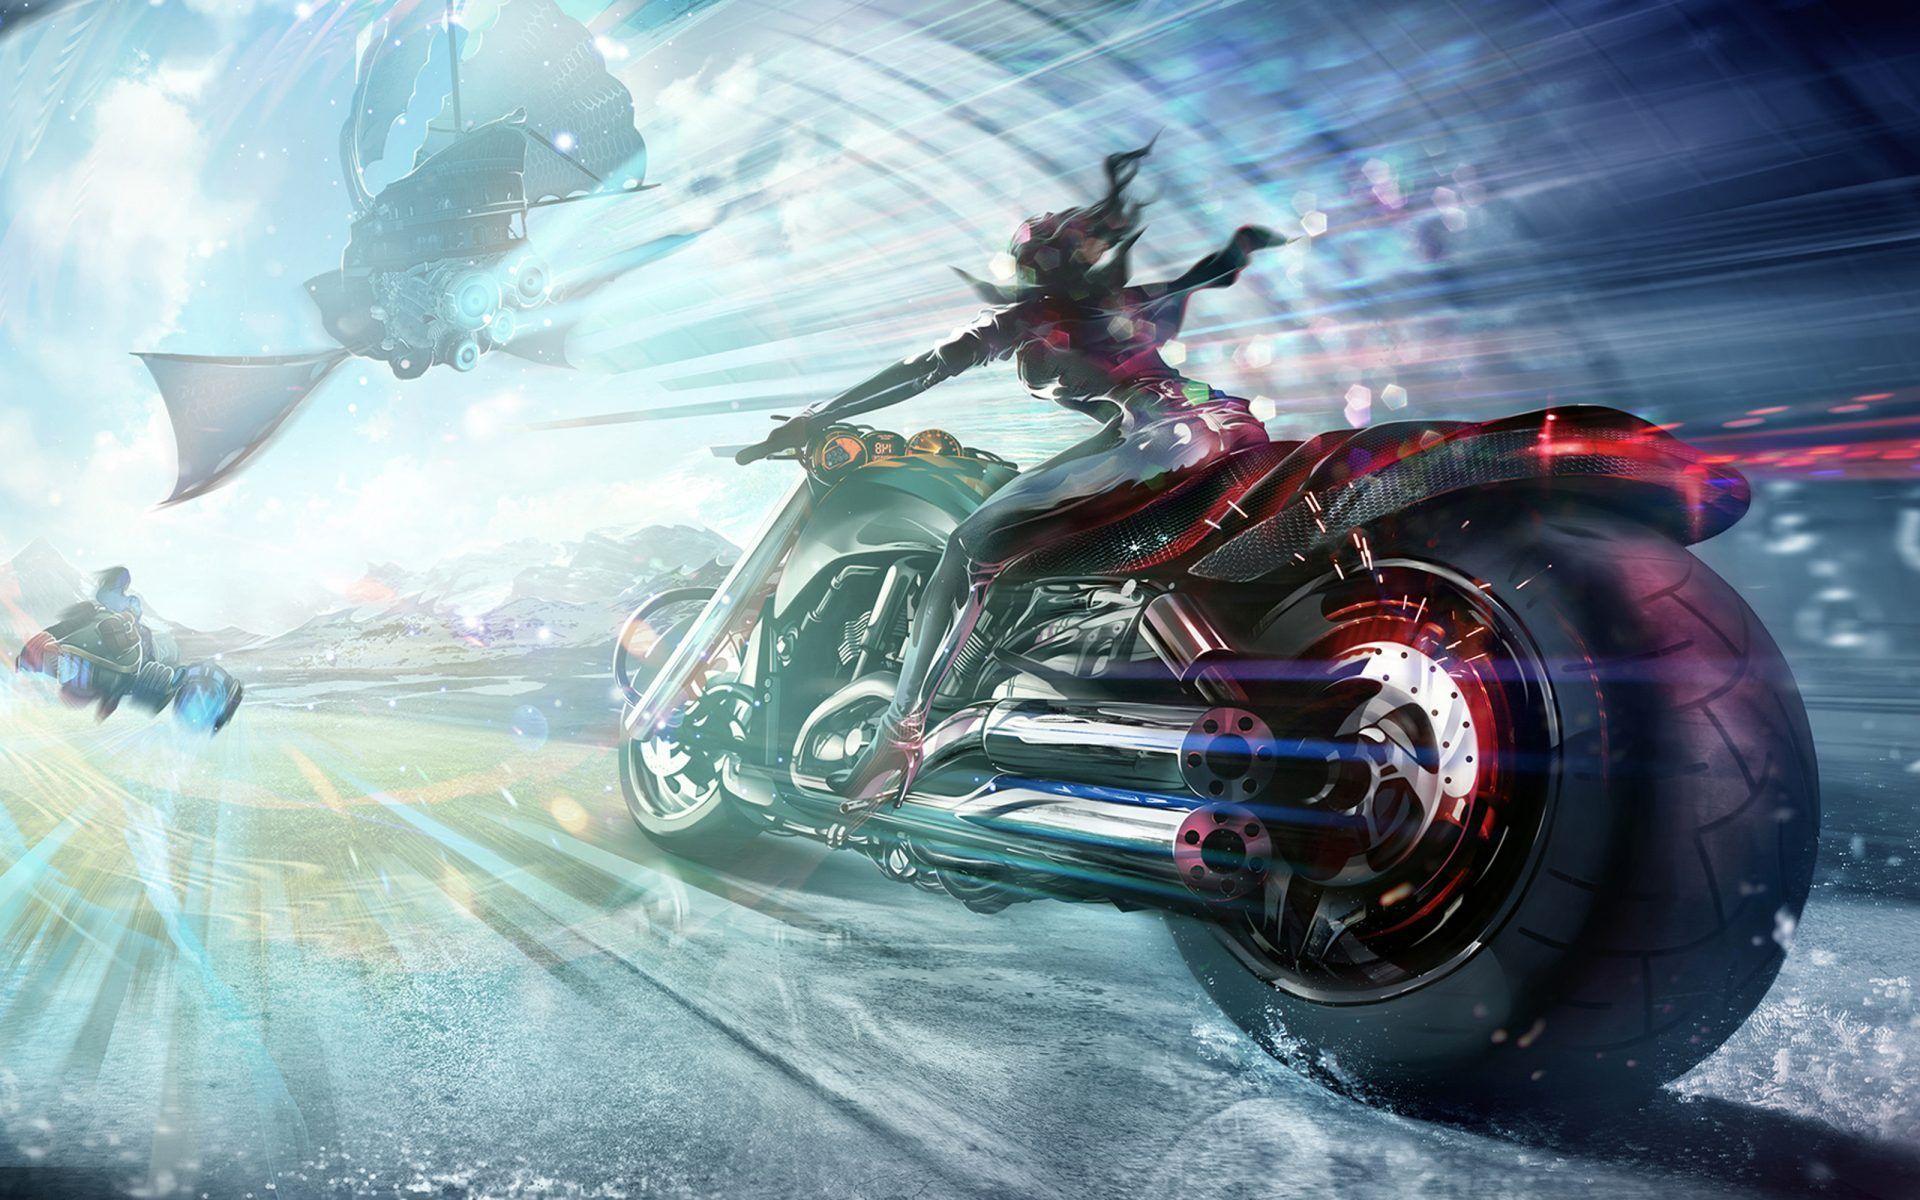 Motorcycle Art Wallpapers - Wallpaper Cave